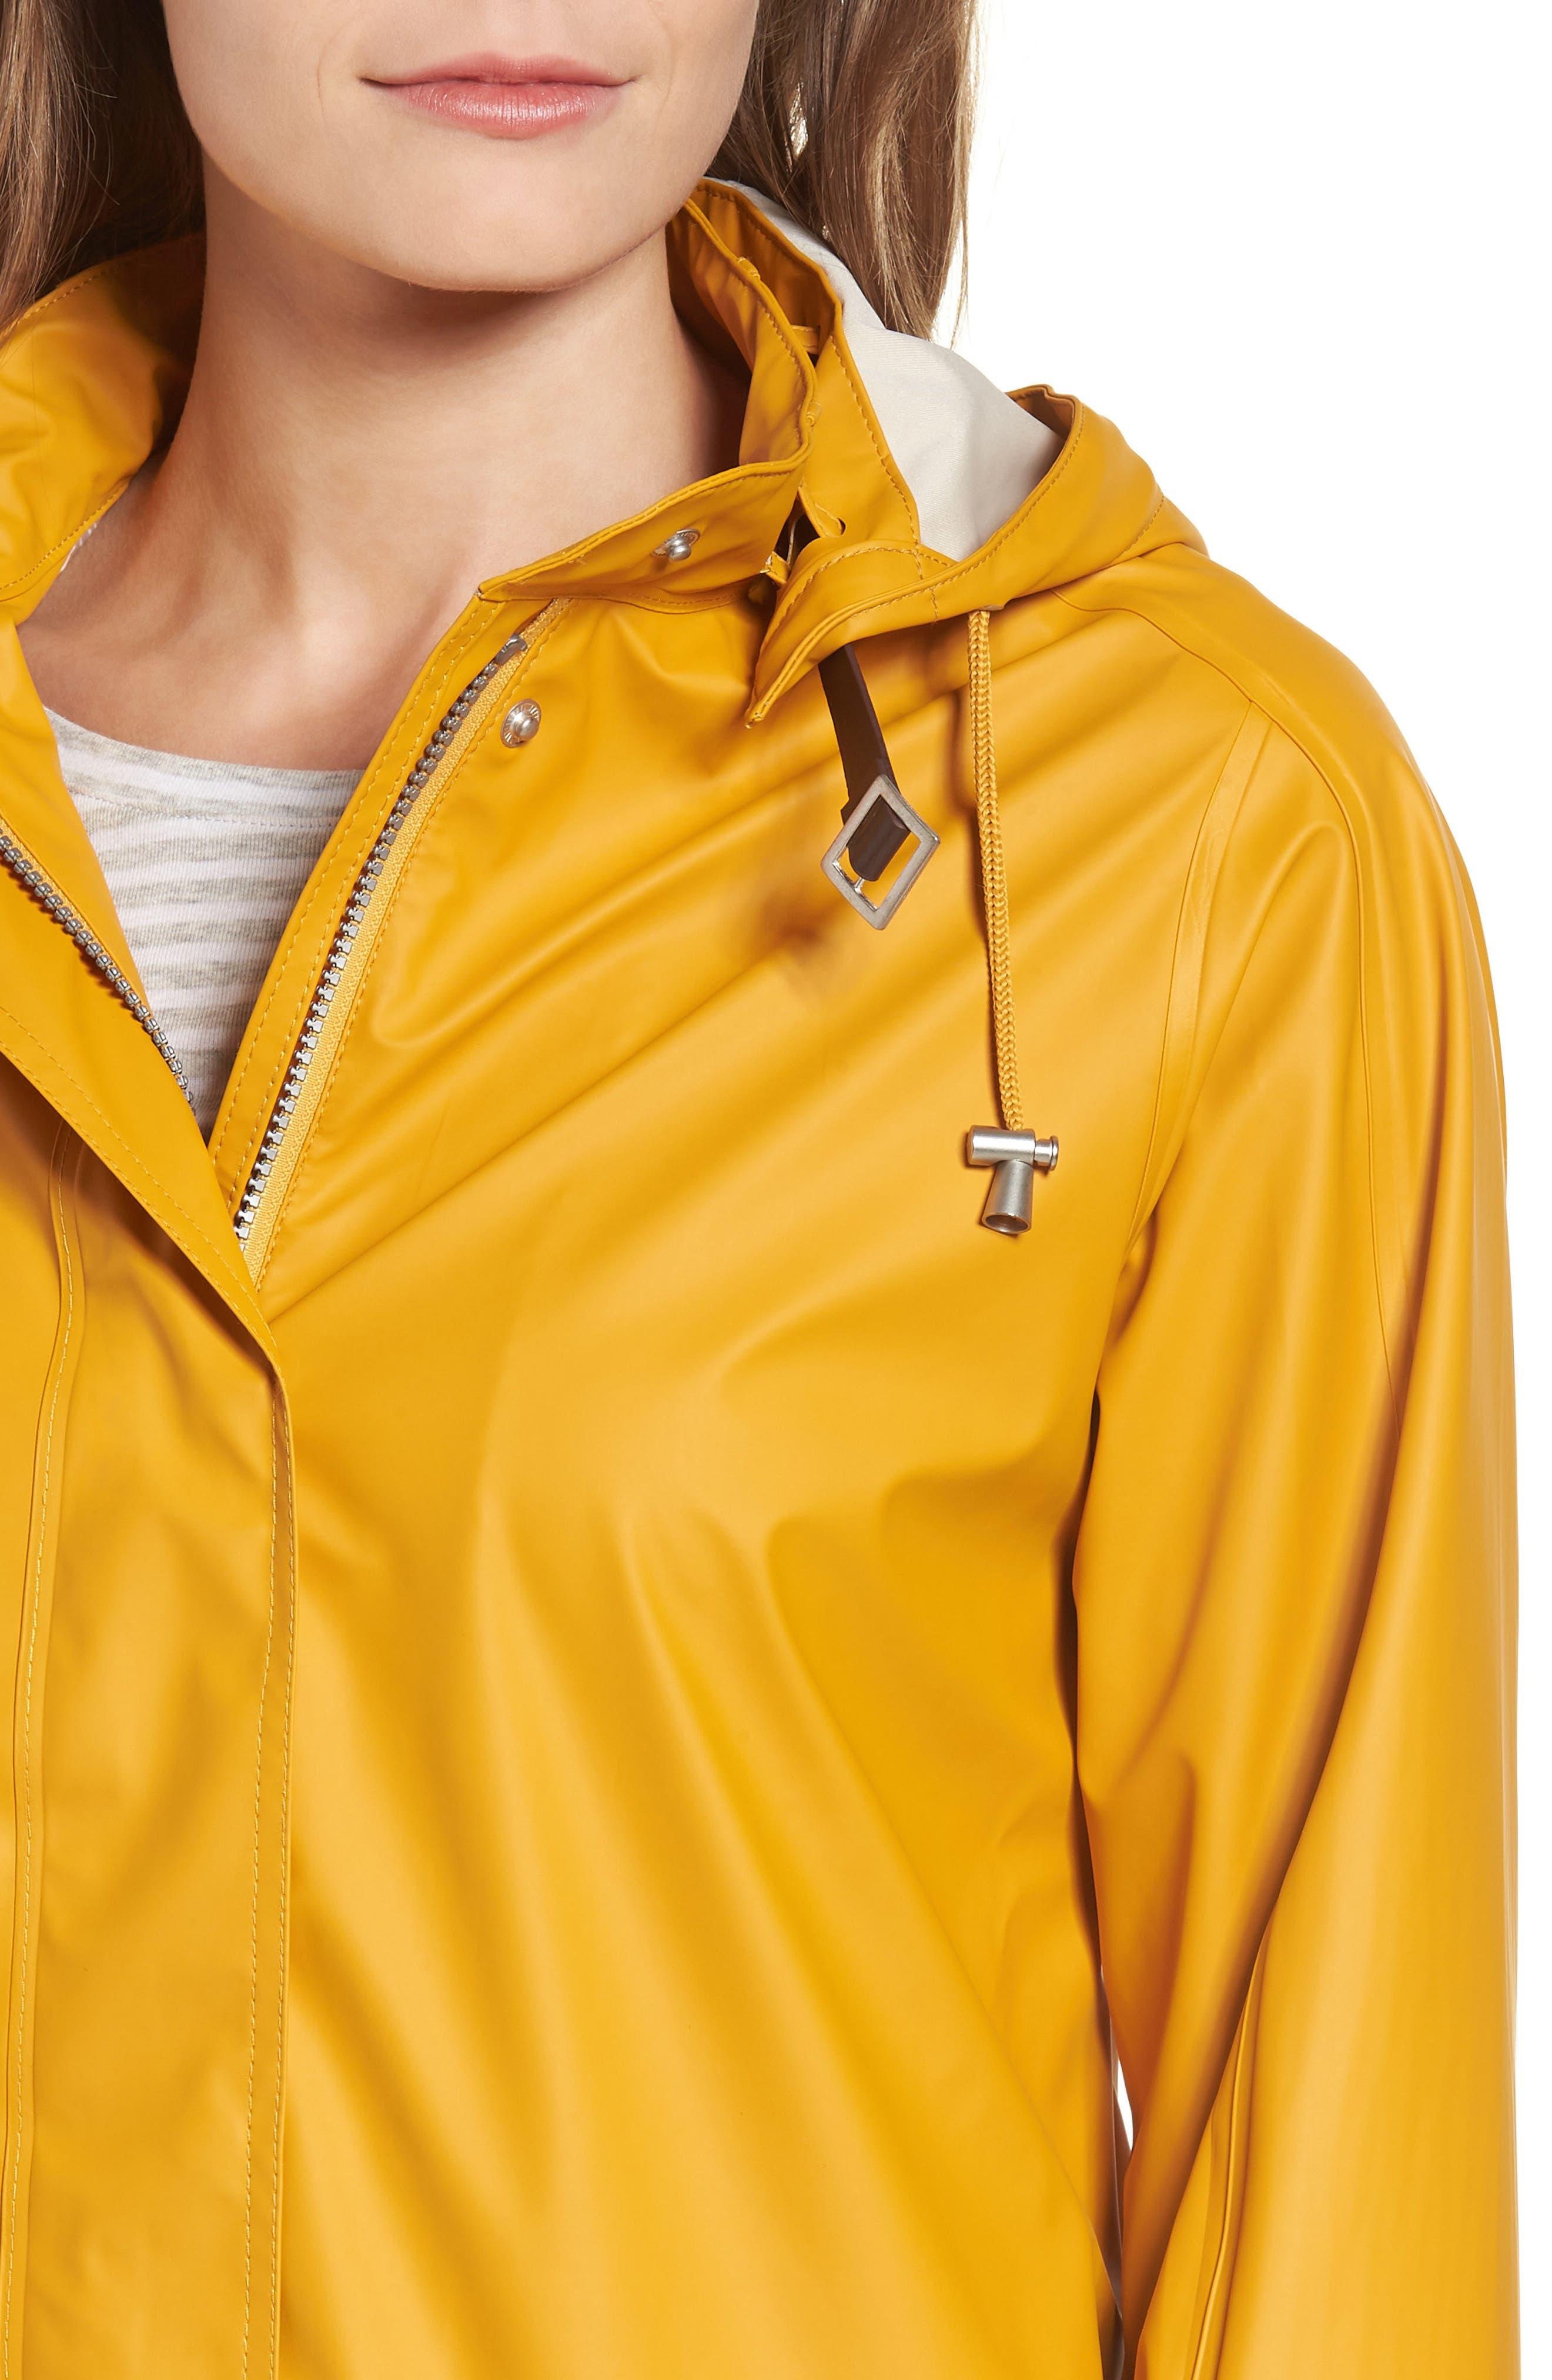 Rain Slicker,                             Alternate thumbnail 4, color,                             Golden Yellow